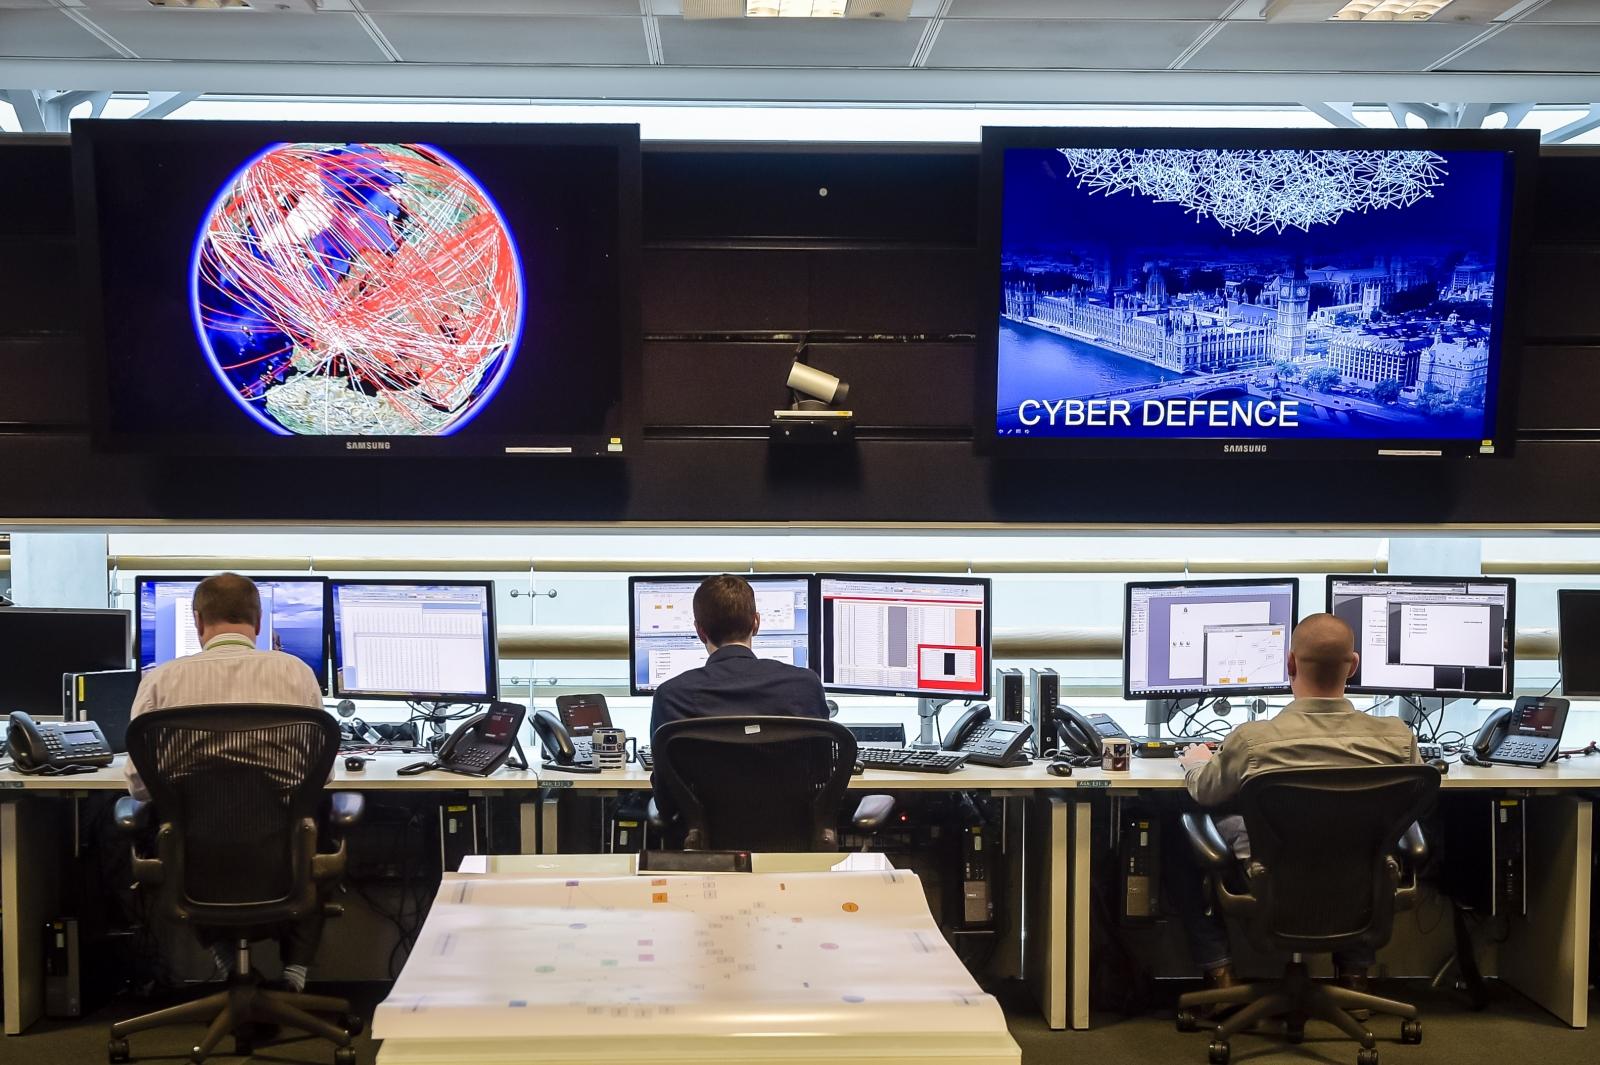 GCHQ cyber defense room